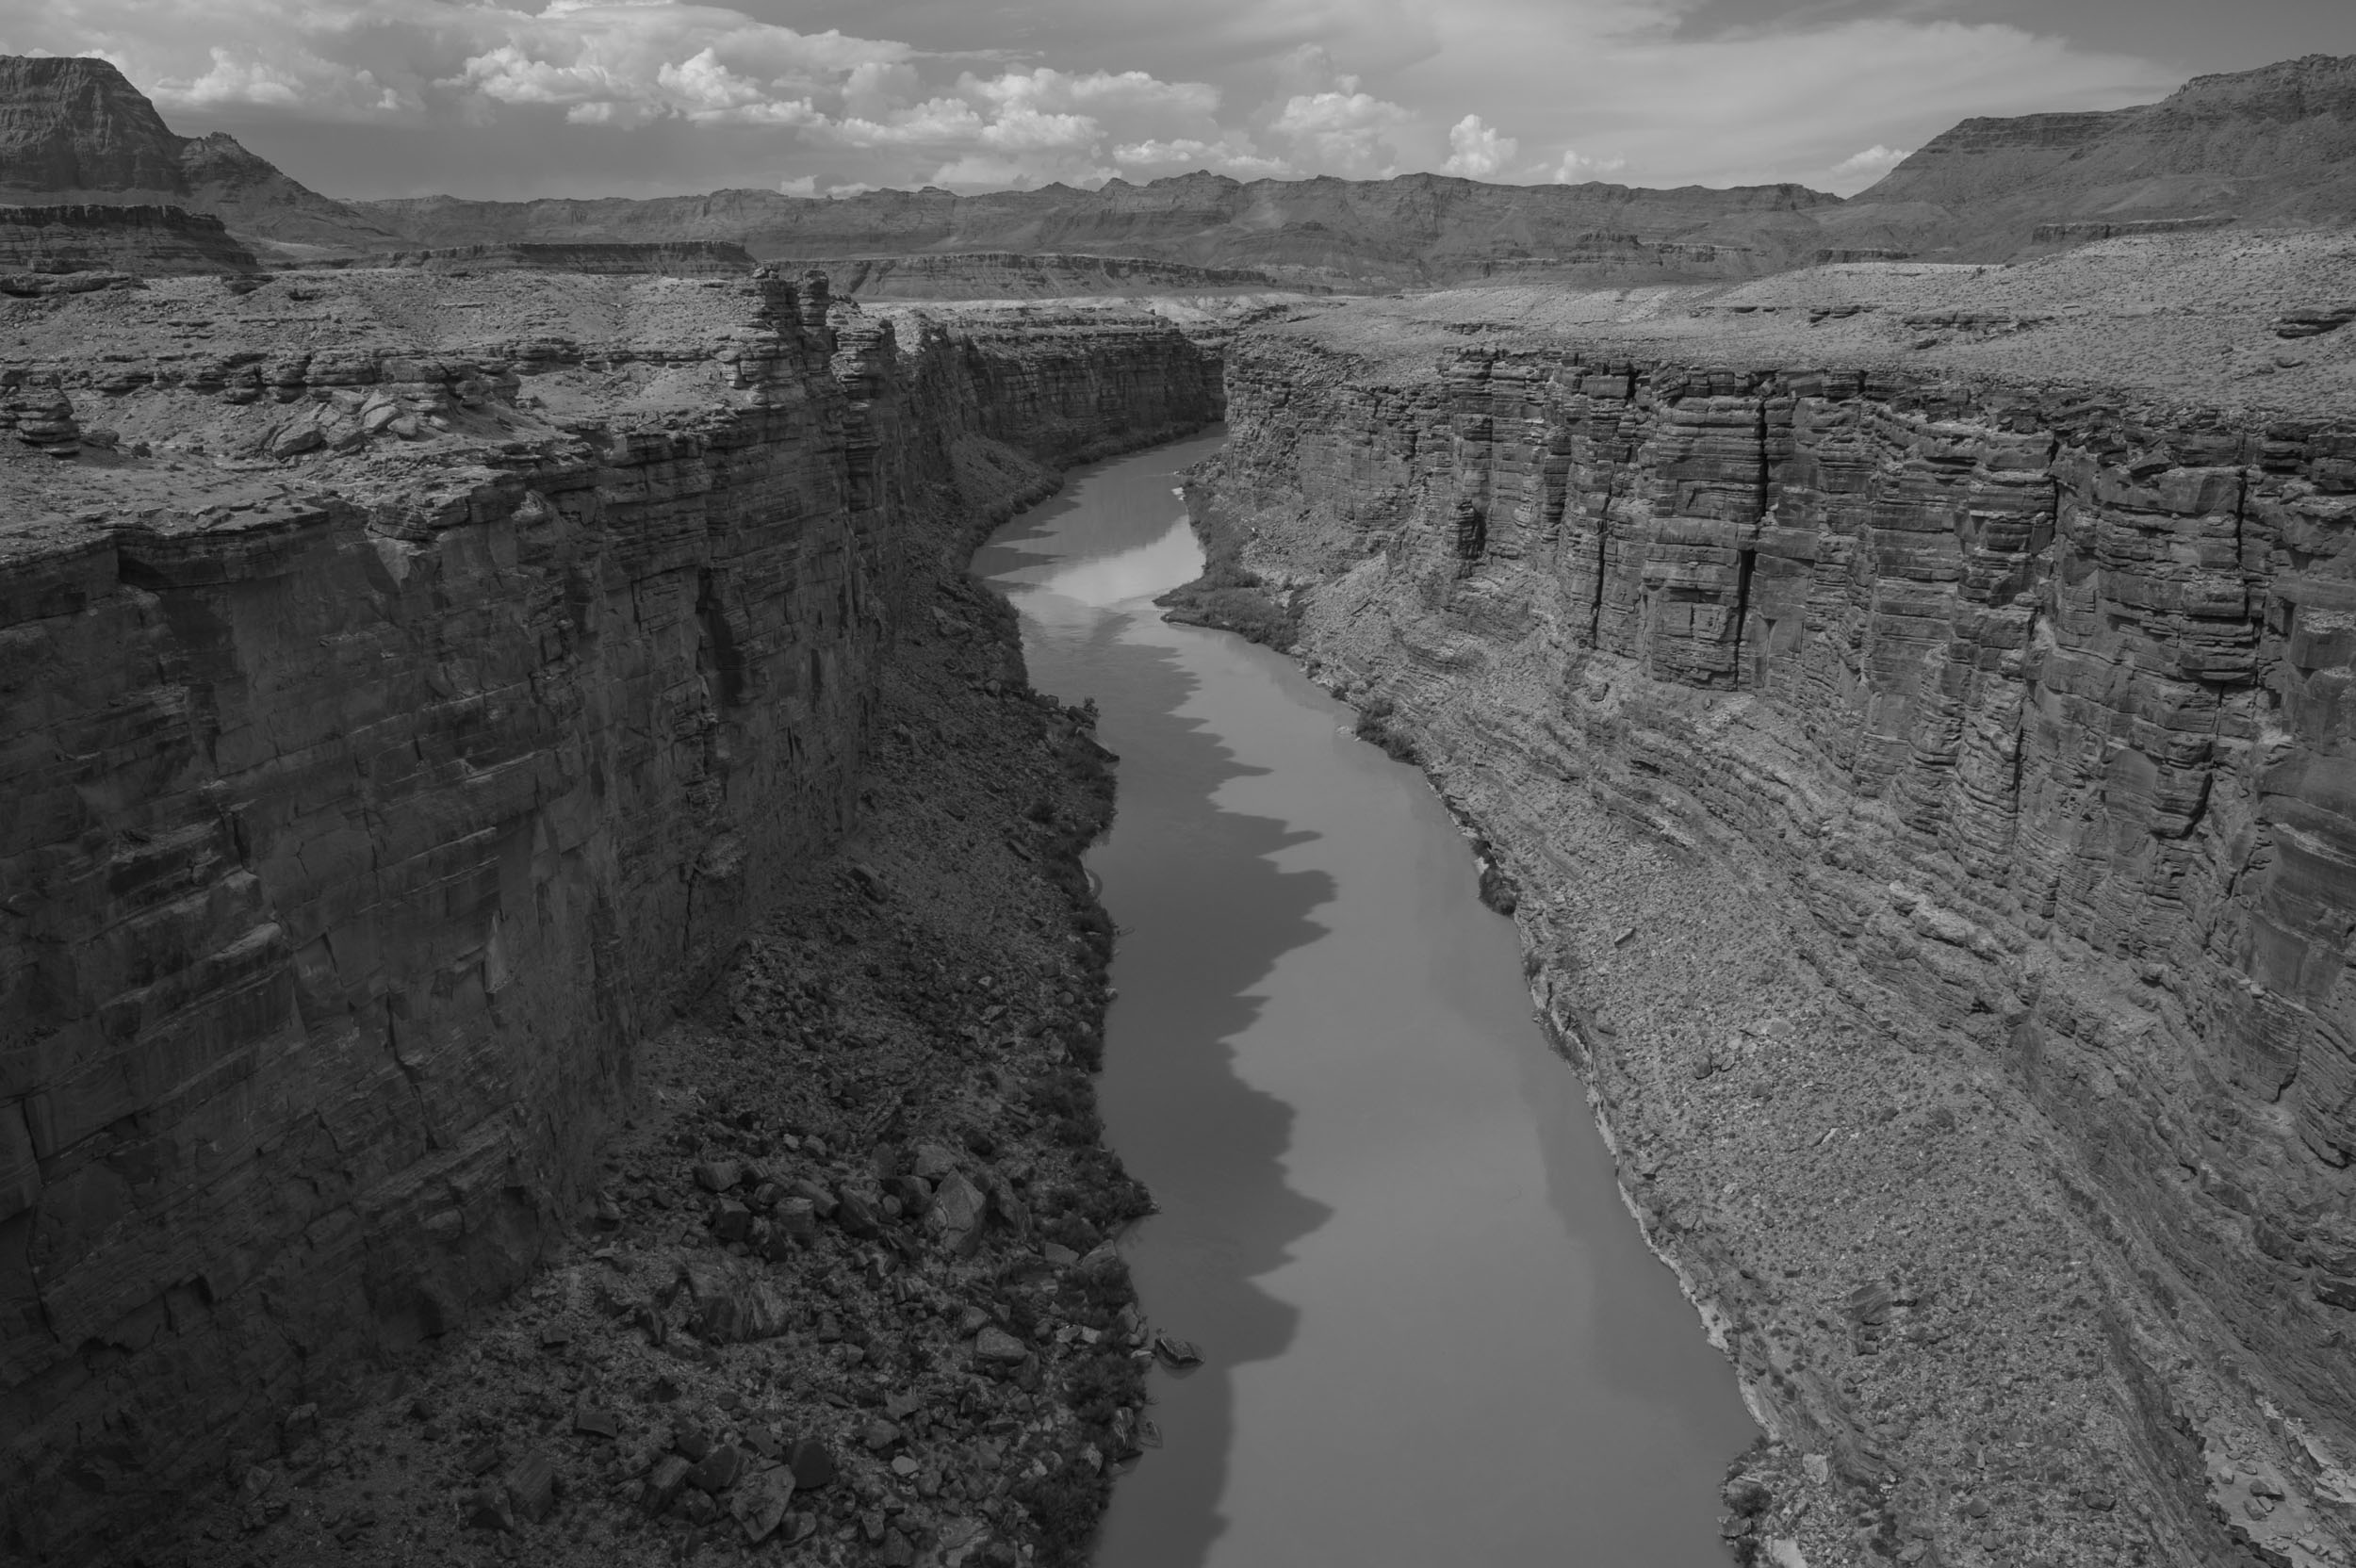 Looking north up the Colorado River from Navajo Bridge on the Navajo Nation, Arizona.